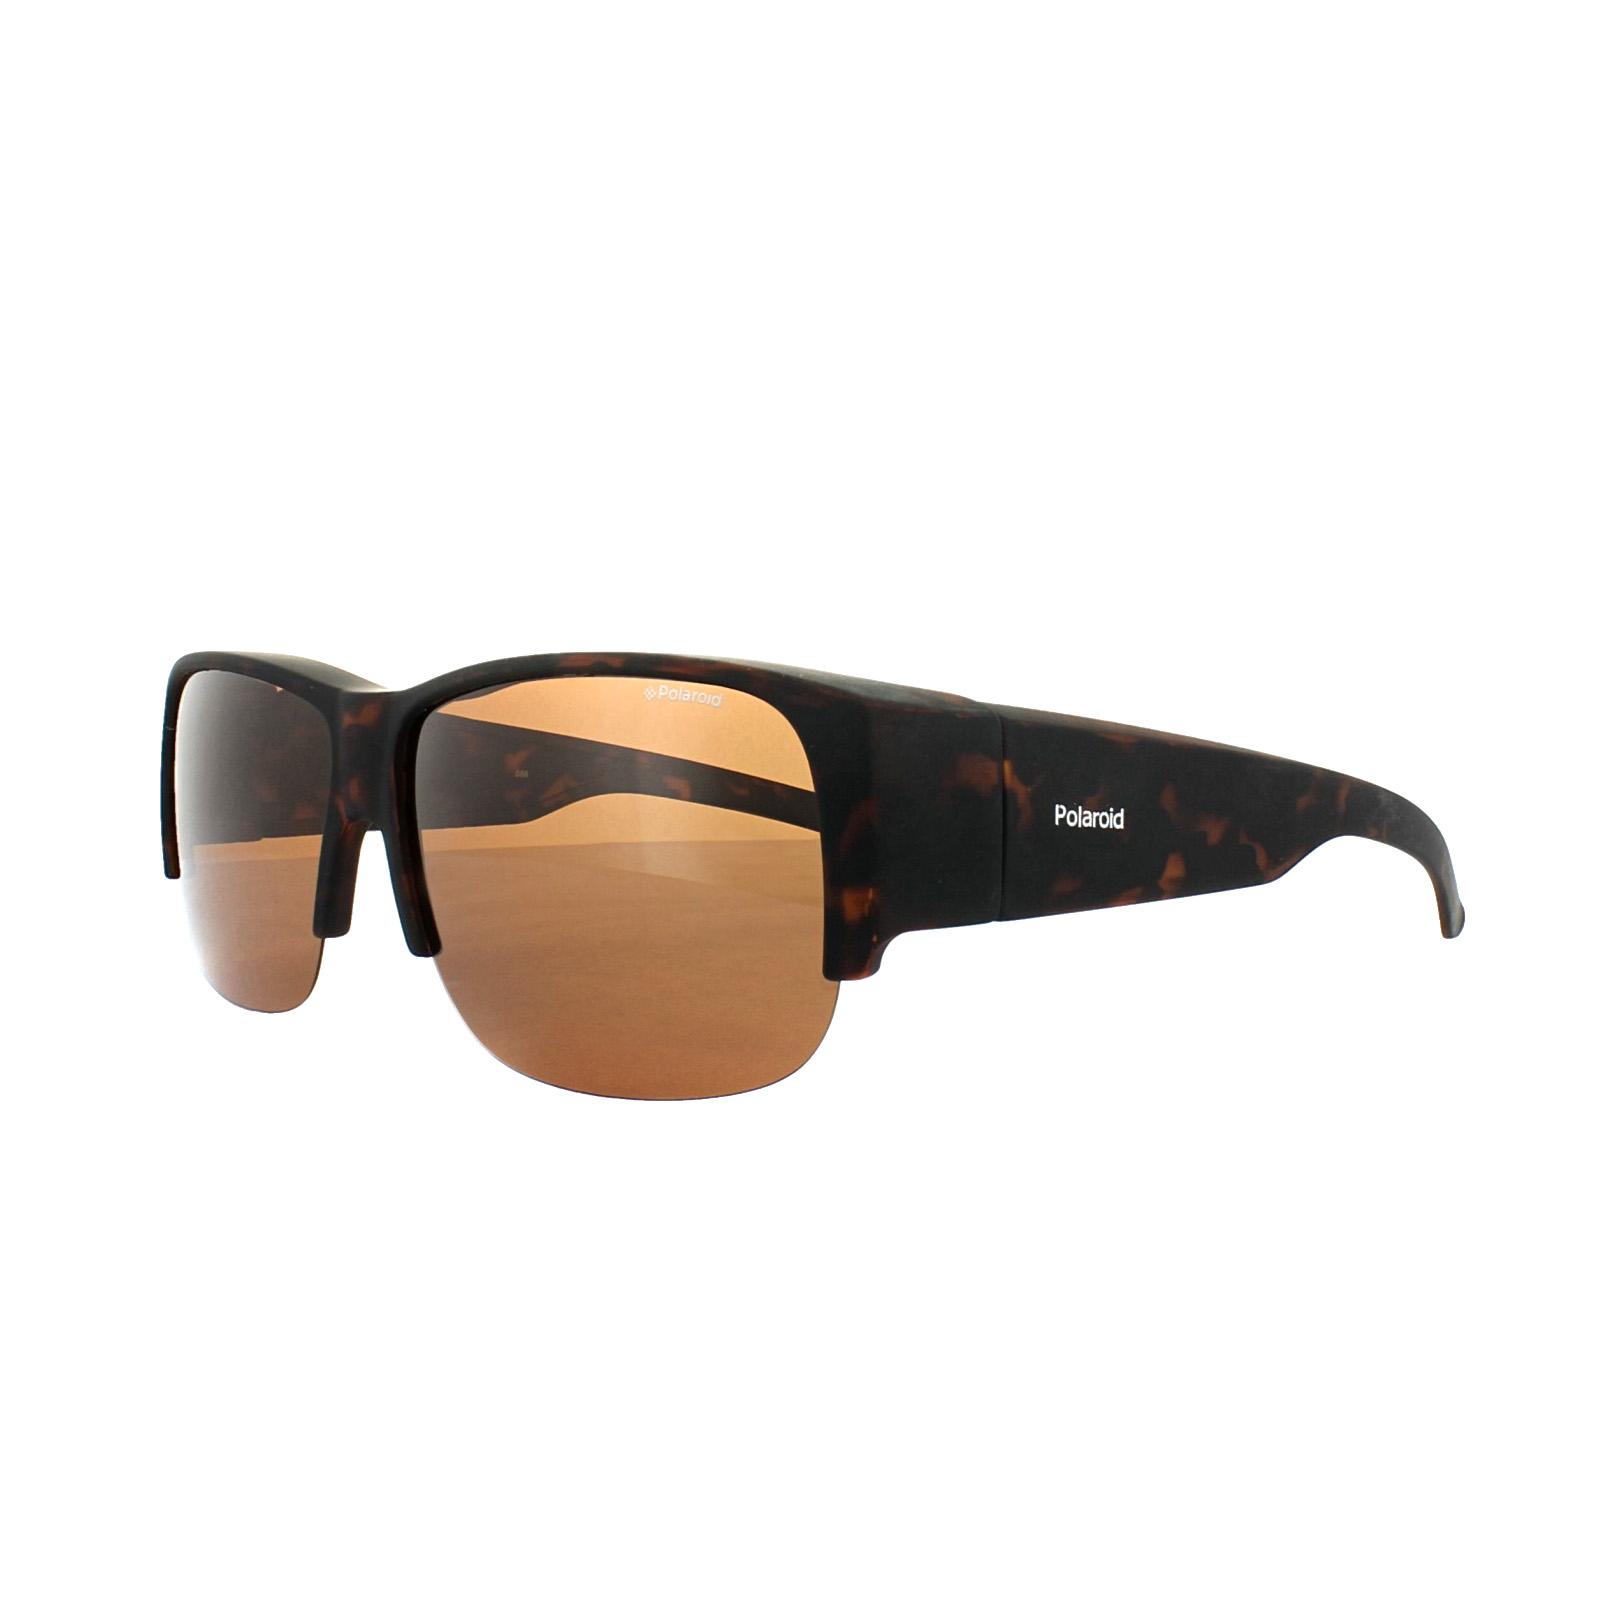 Cheap Polaroid Suncovers Fitover PLD 9007 S Sunglasses - Discounted ... 3ec1e77a66